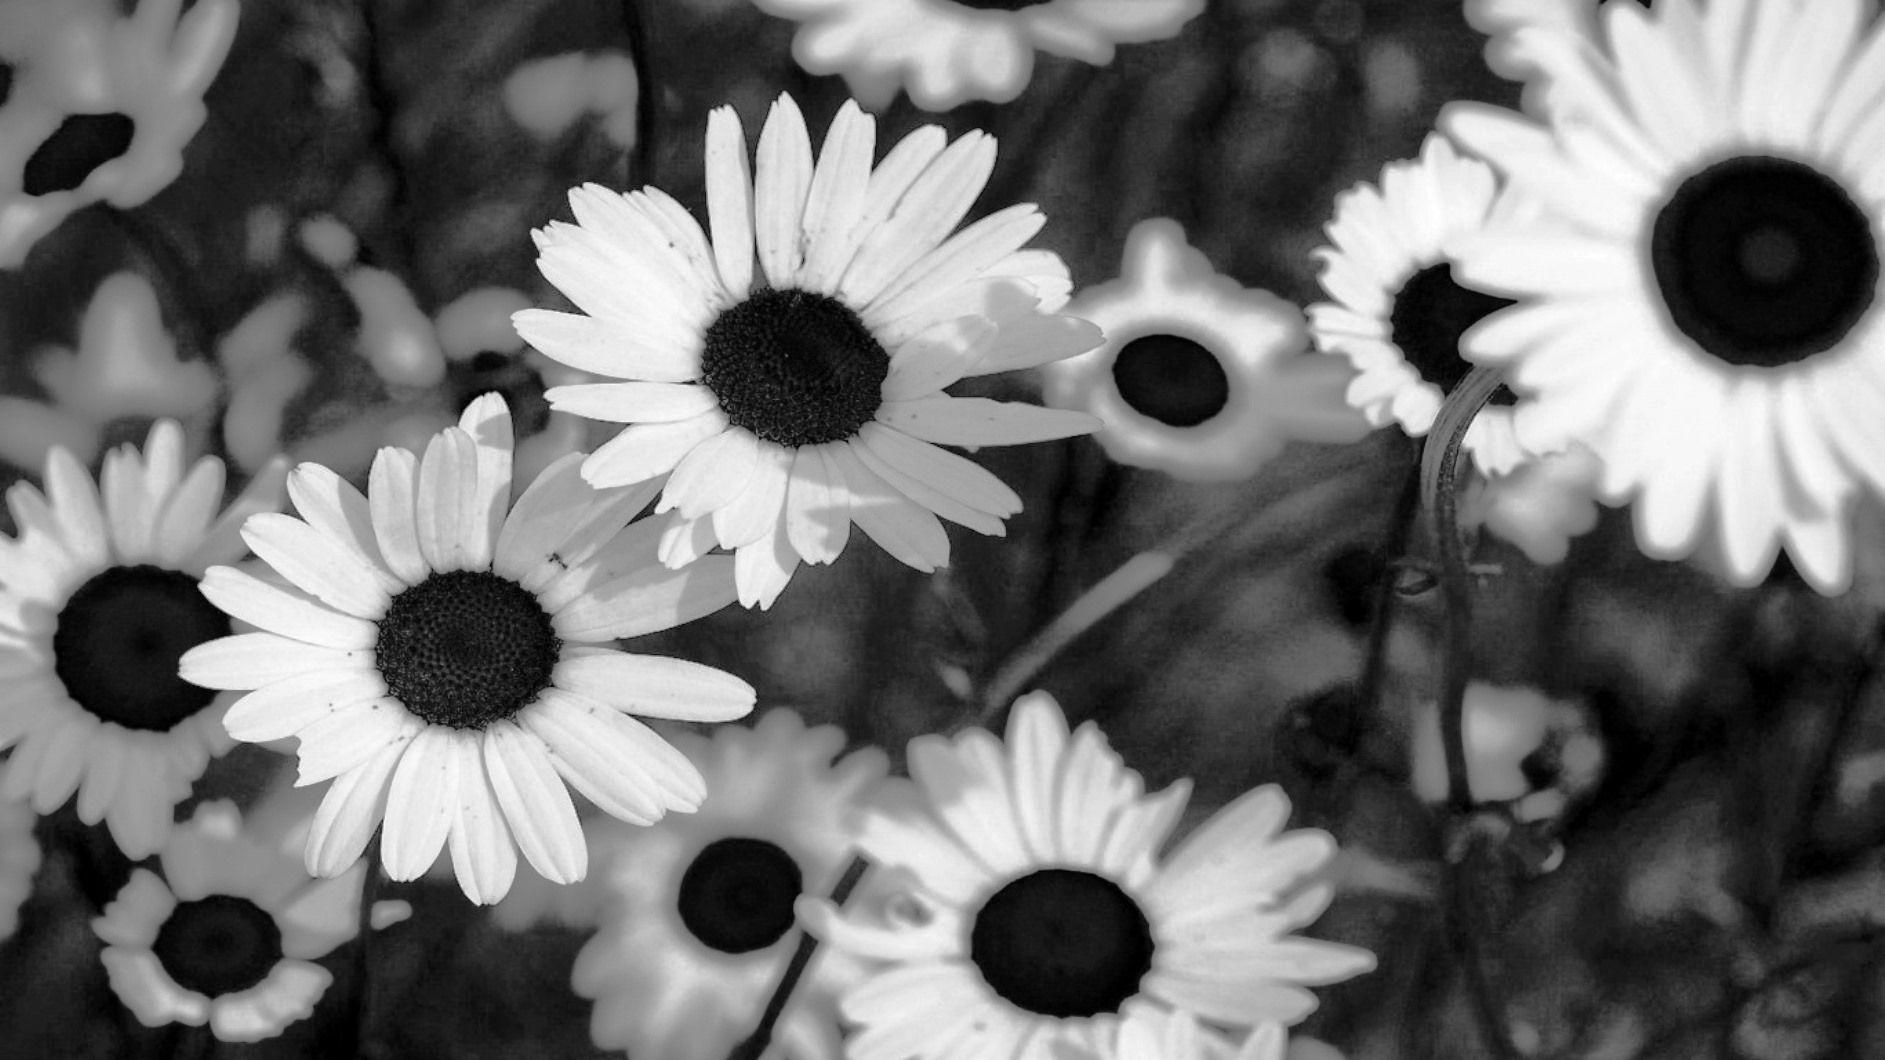 Tumblr Wallpapers Black And White Flowers E2 80 93 Background Rose Flower Black 1885x1060 Wallpaper Teahub Io